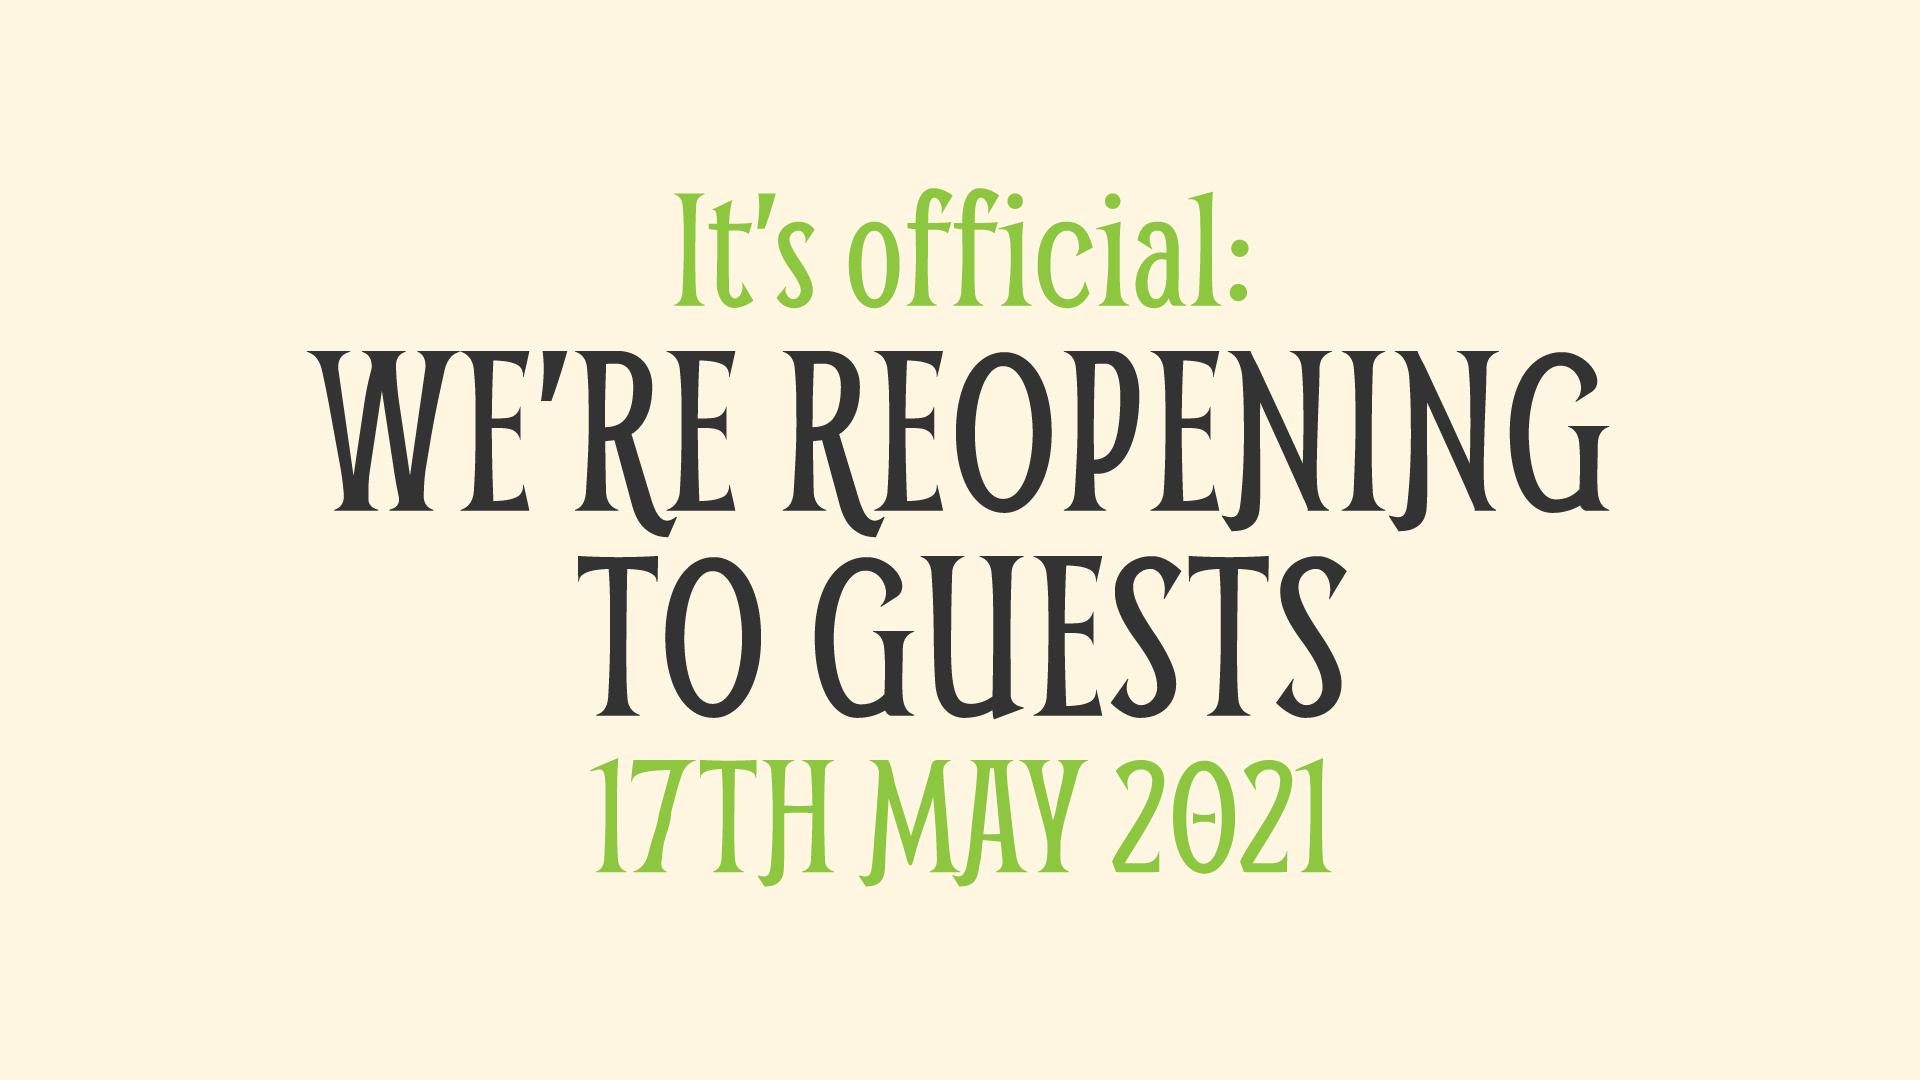 We're reopening